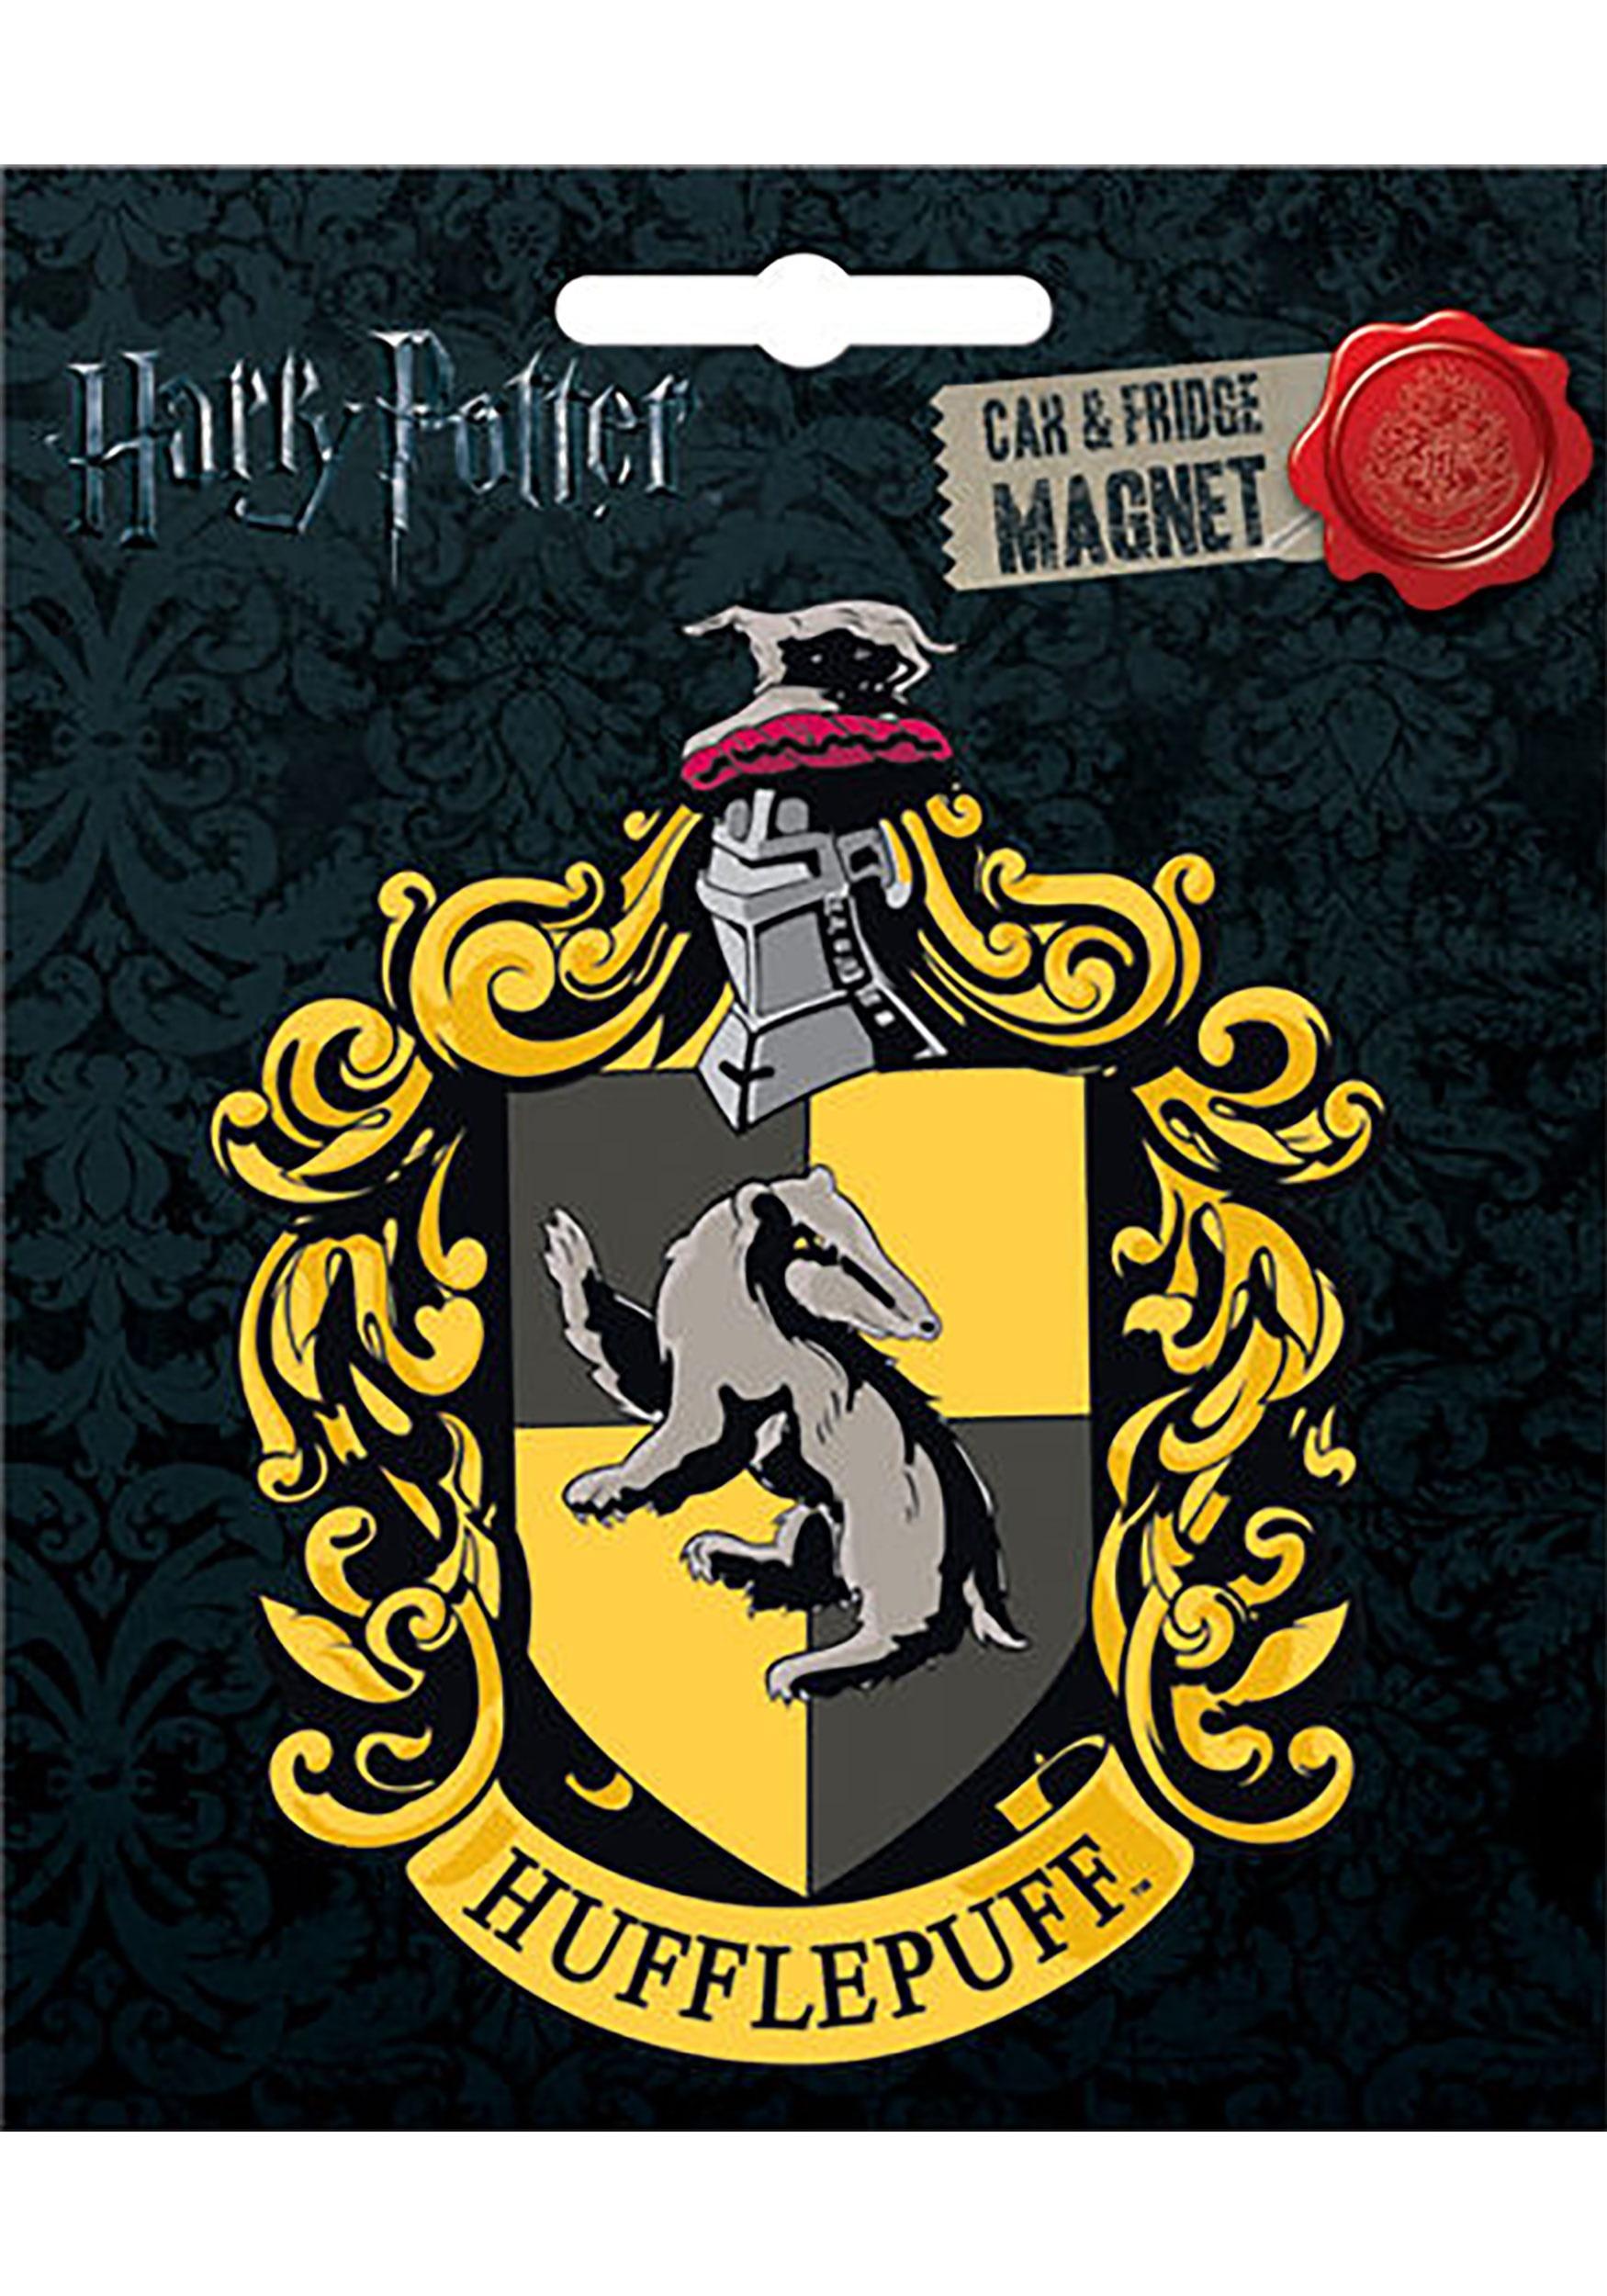 Harry_Potter_Hufflepuff_Car_Magnet